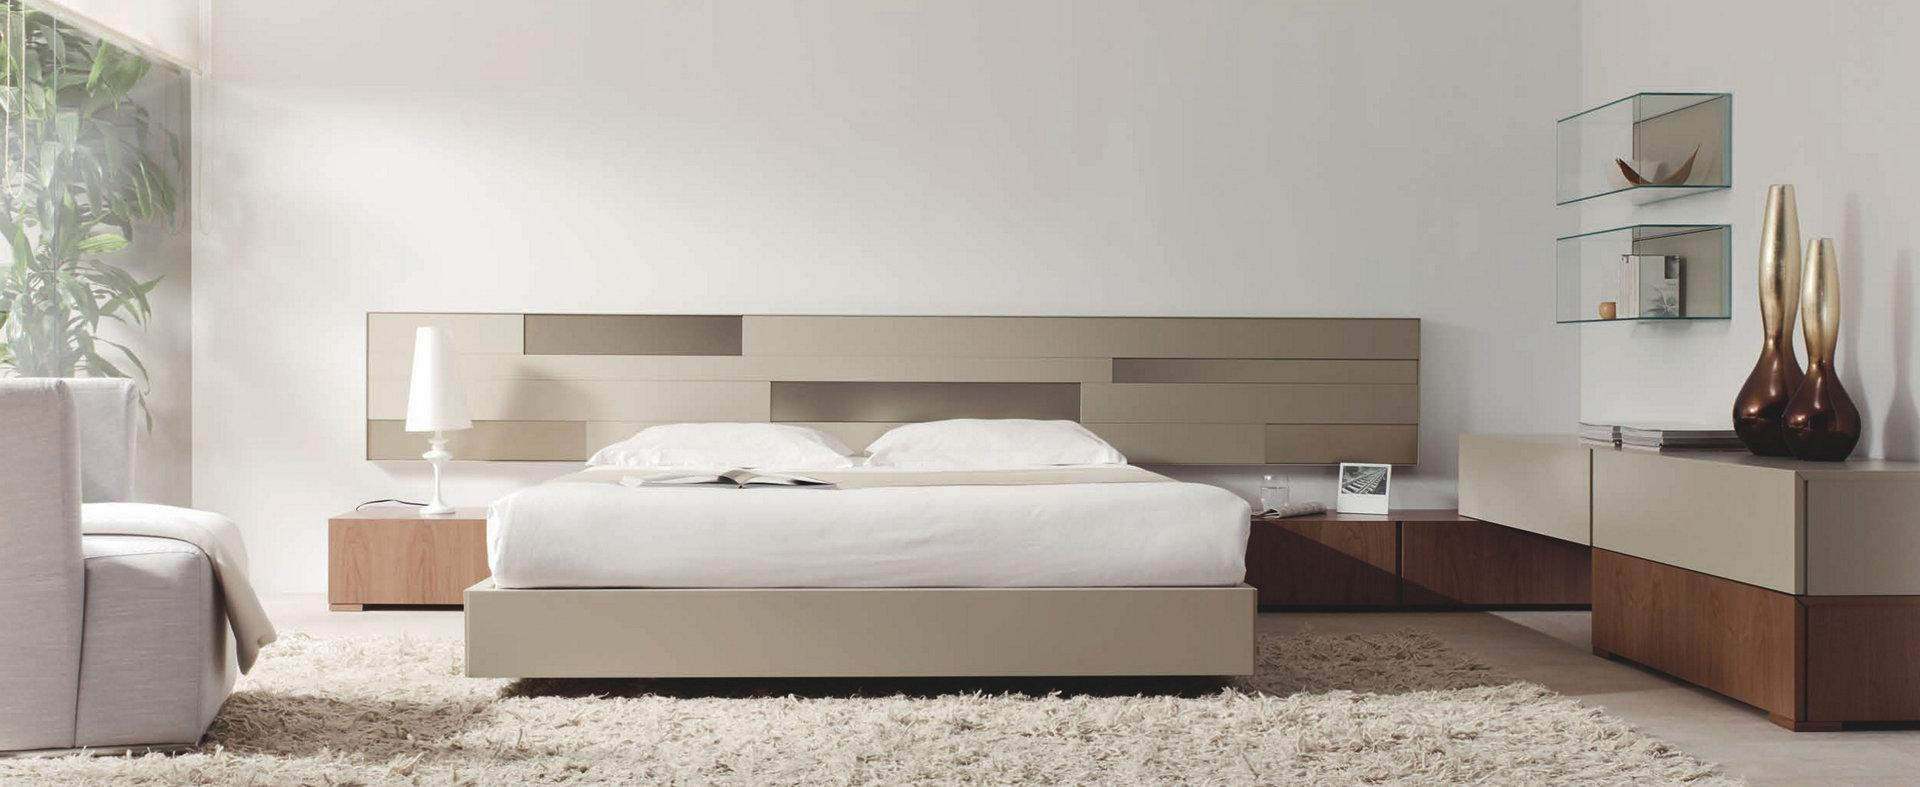 Fotos de dormitorios modernos dormitorios de matrimonio for Dormitorios modernos